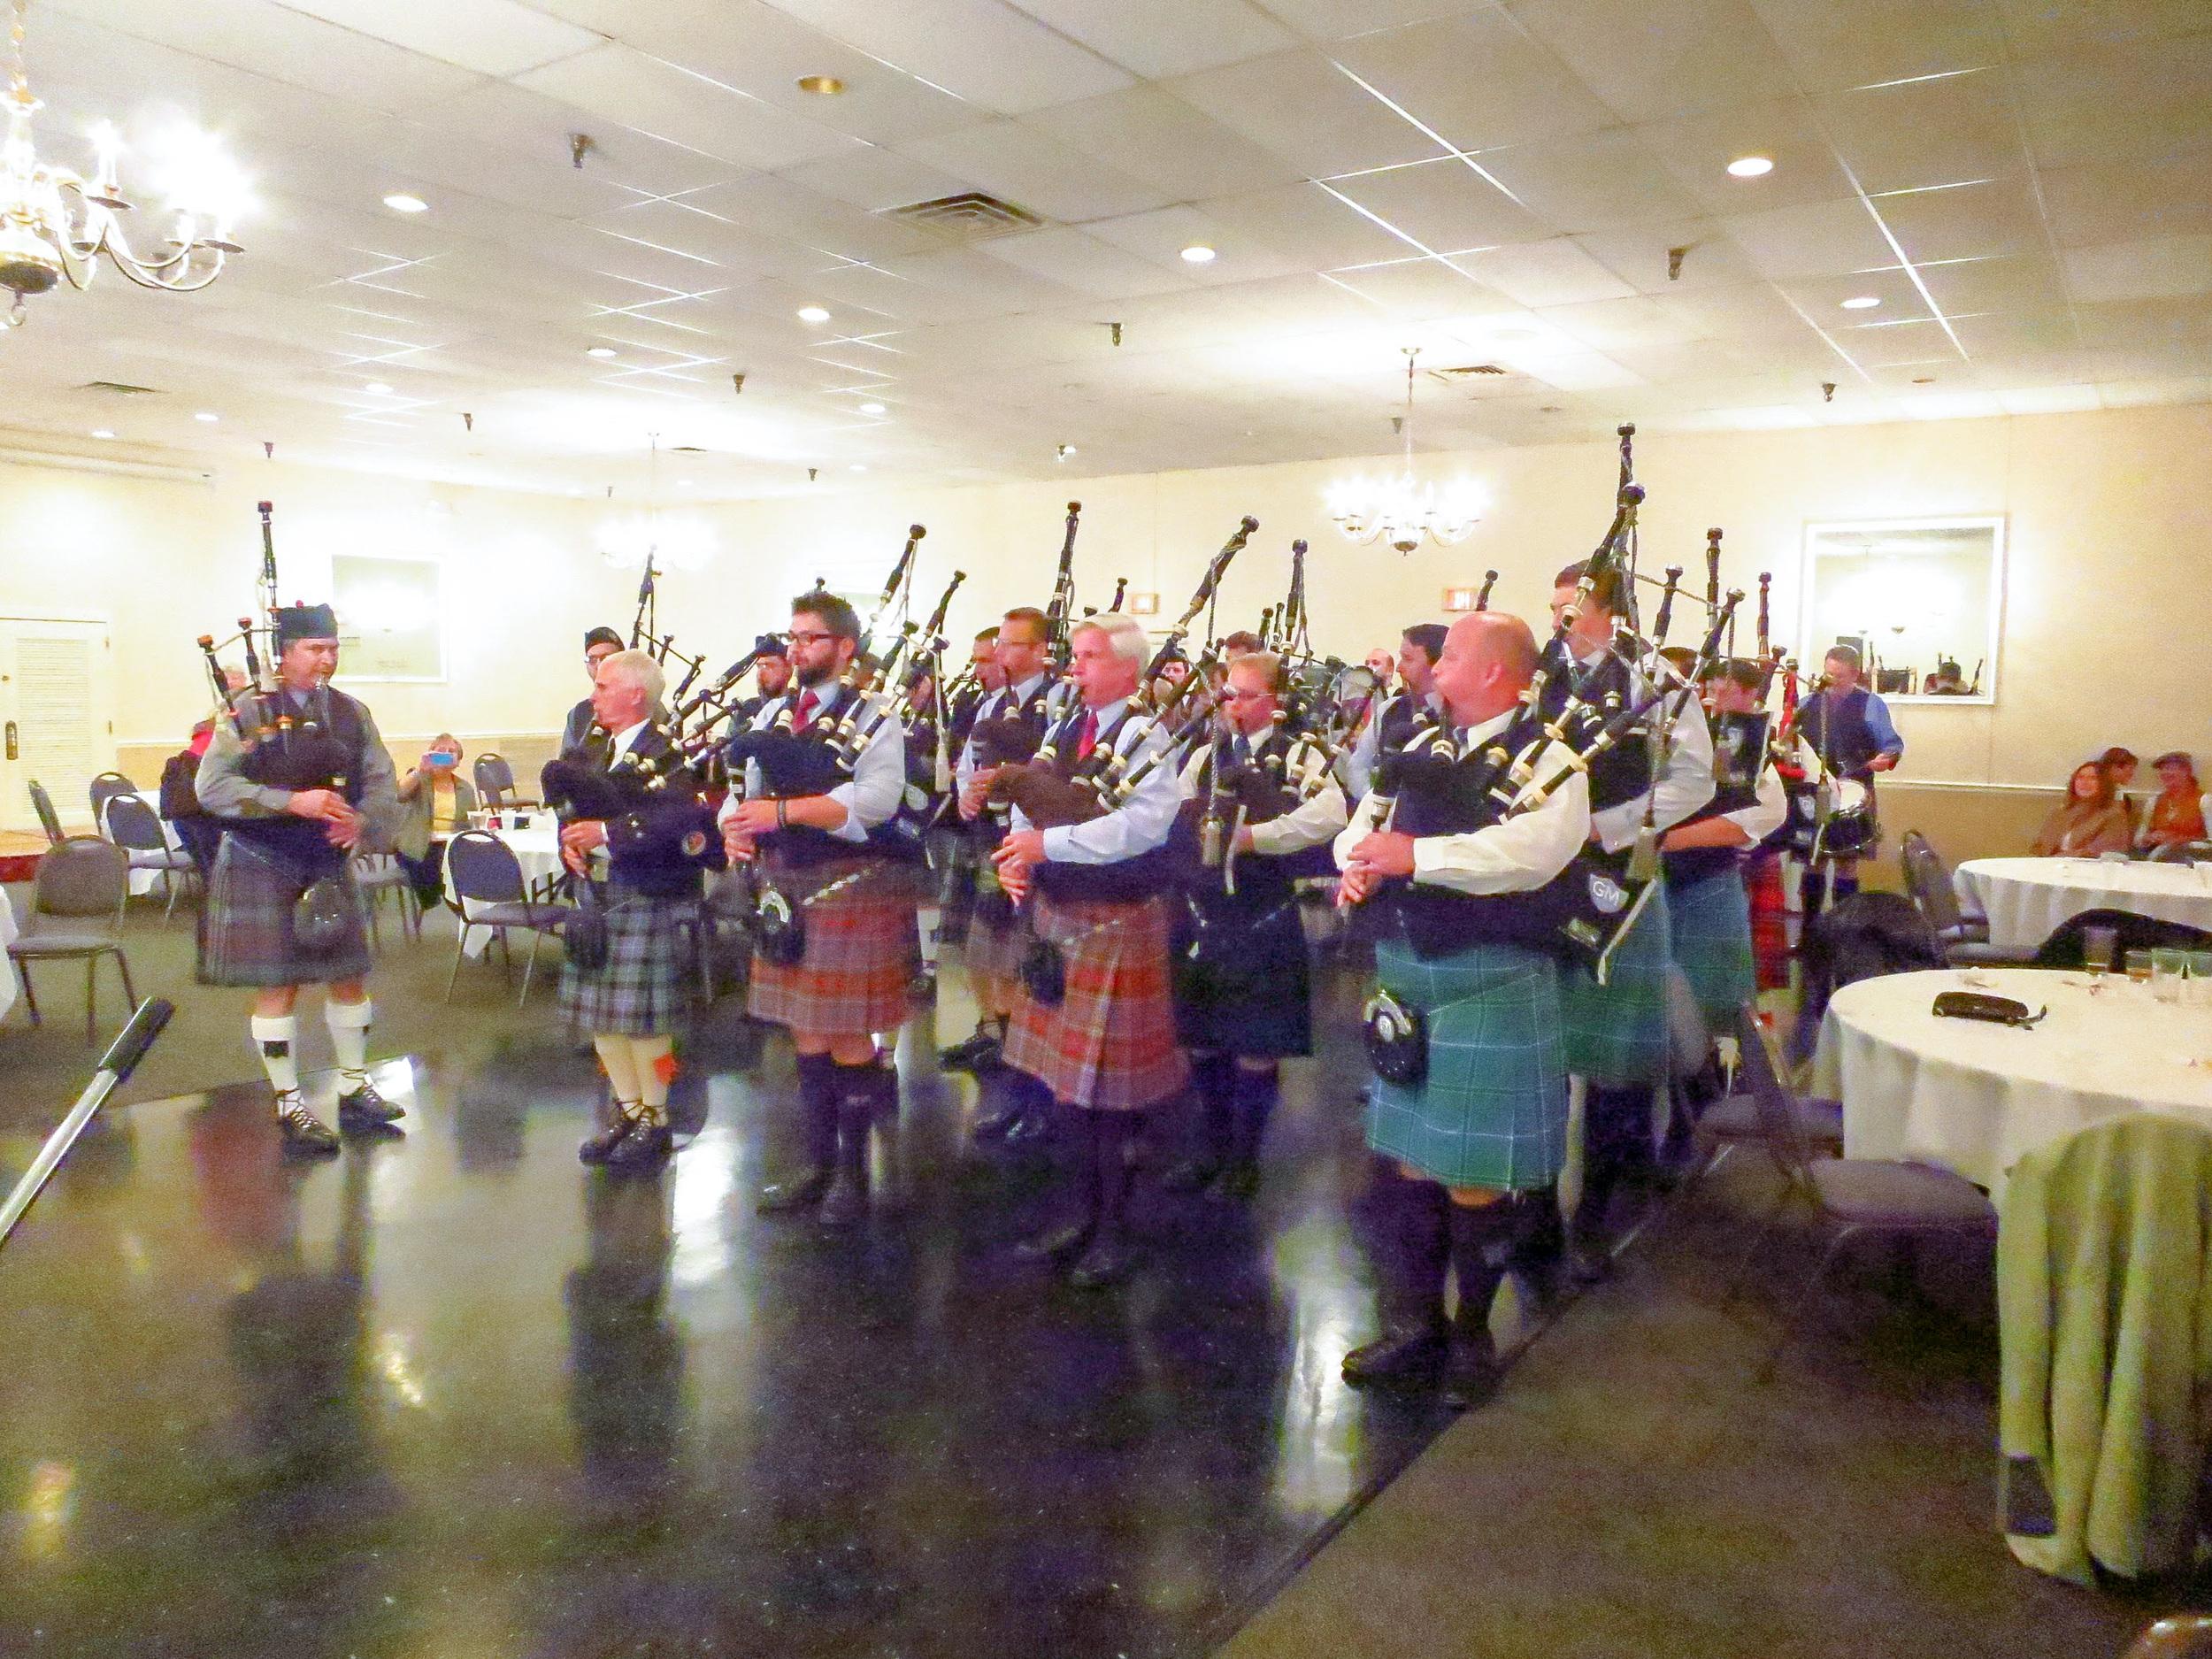 2014-Fall-Highland-Gathering (26 of 26).jpg